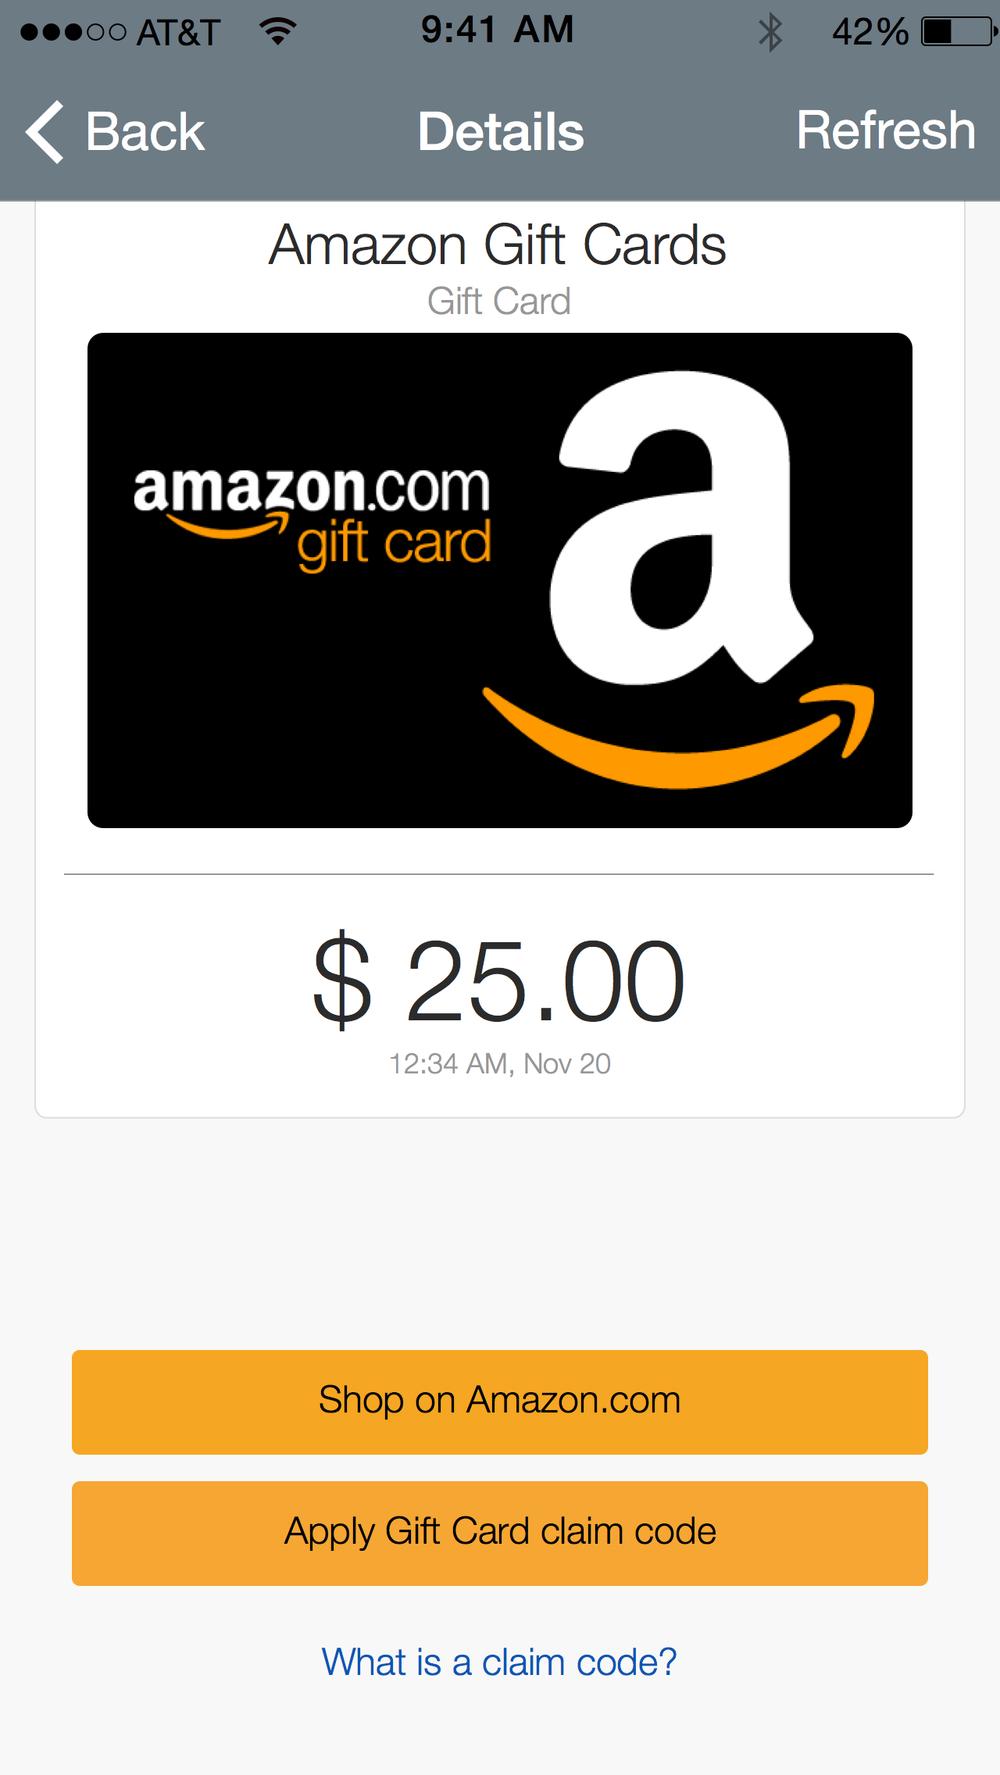 AmazonGift.jpg